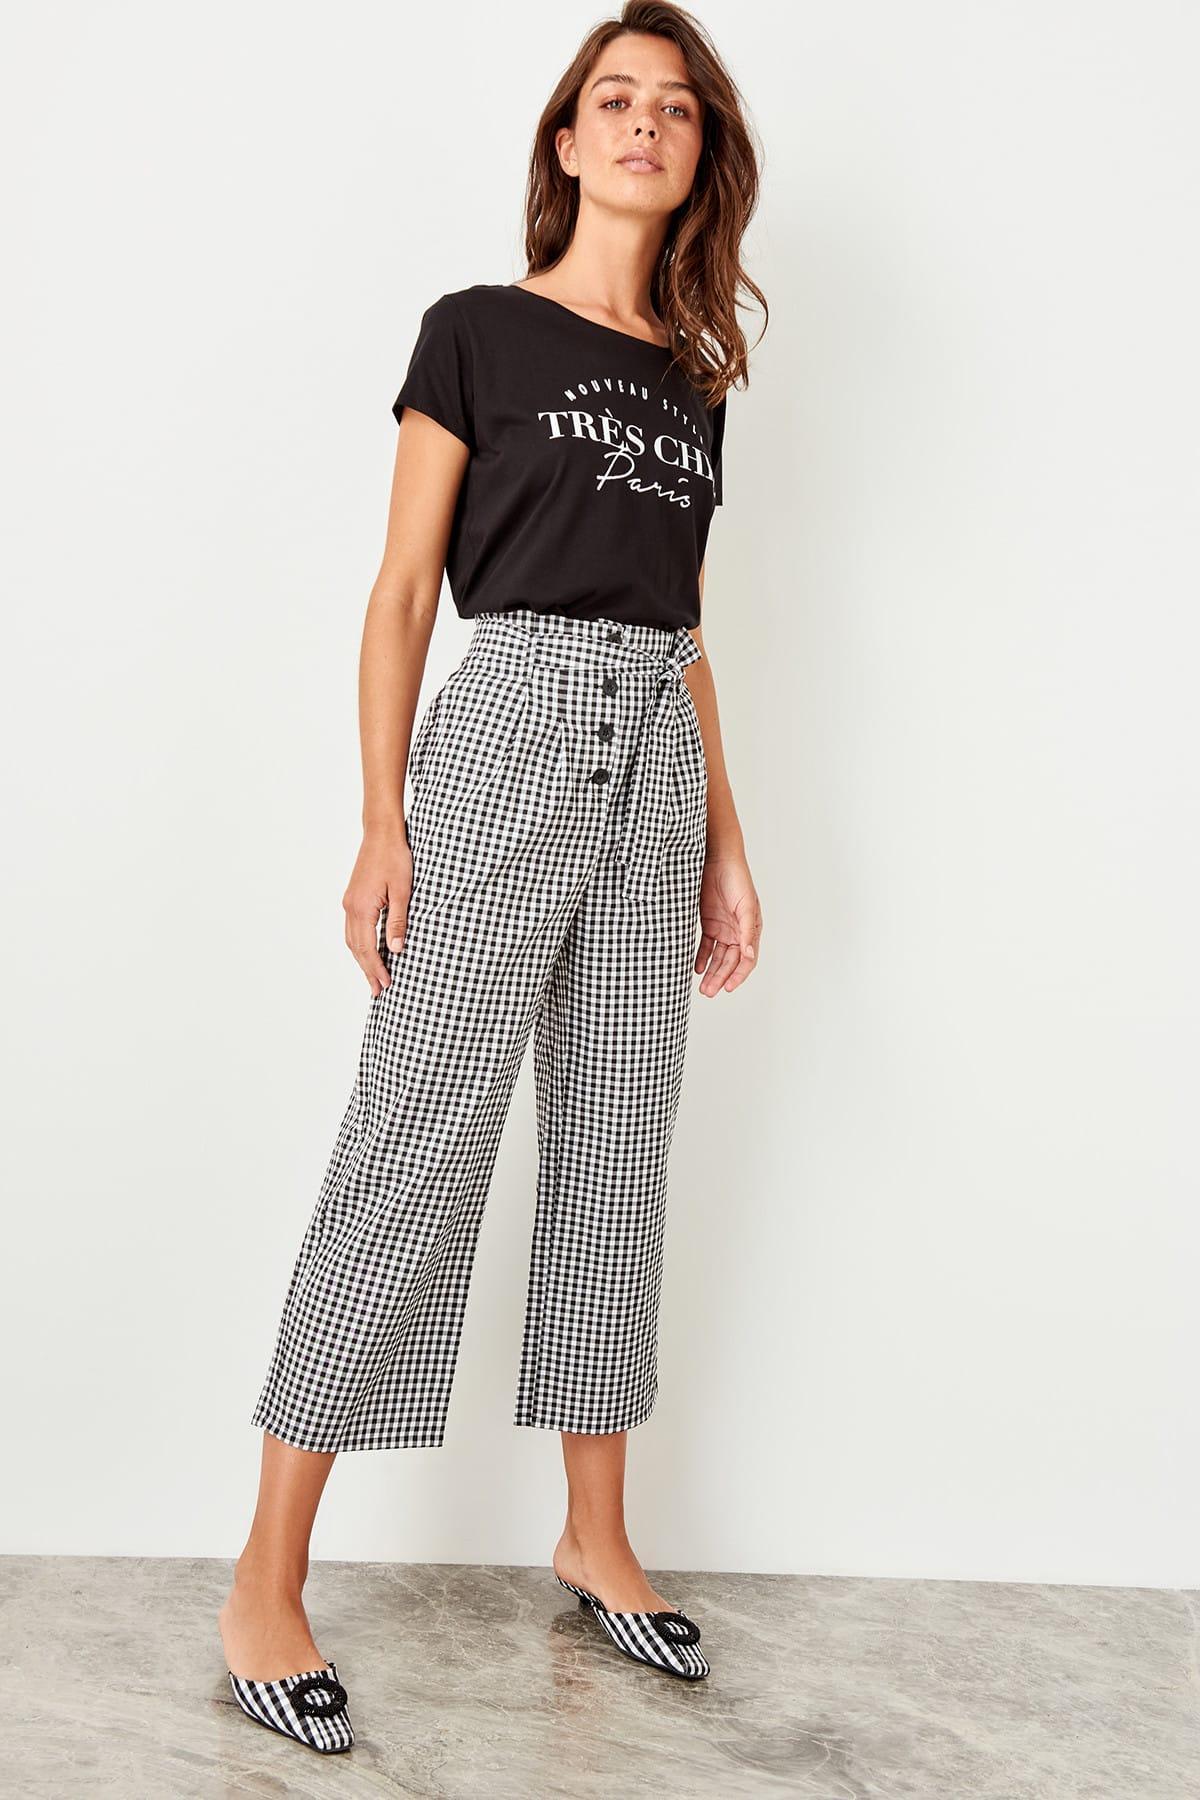 Trendyol Black High Waist Plaid Pants TWOSS19XB0176